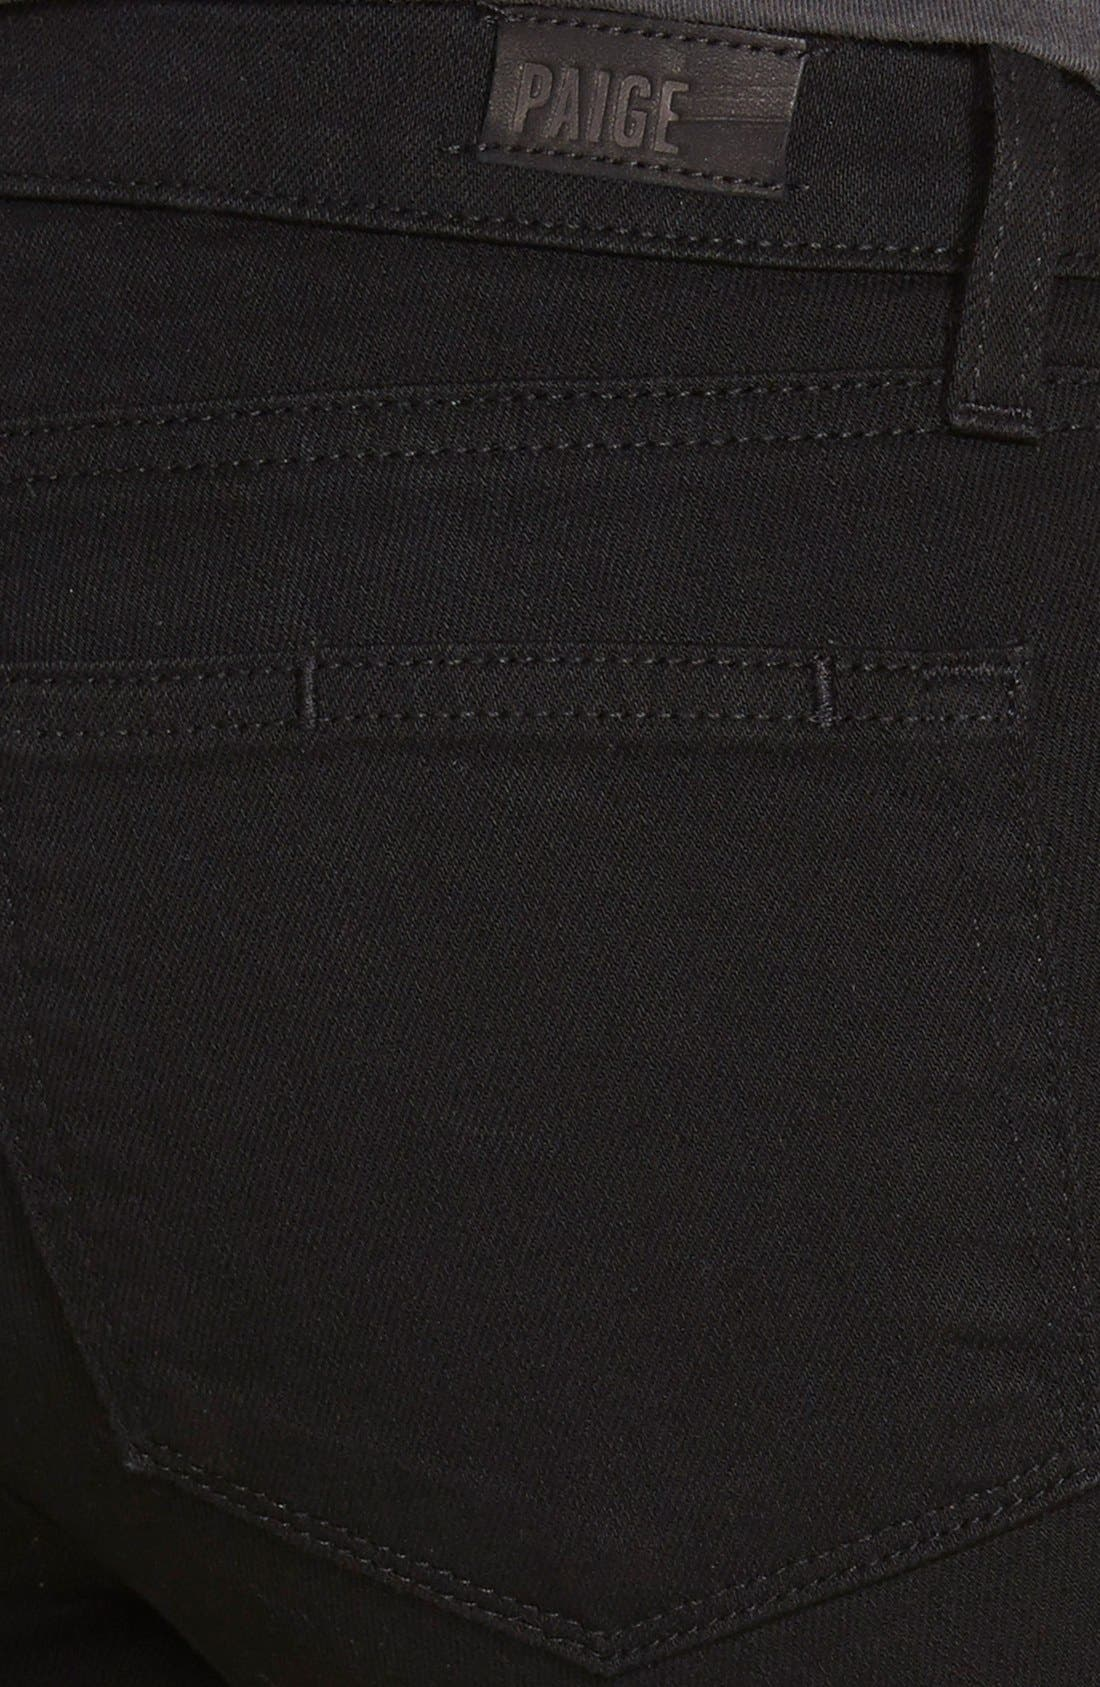 Alternate Image 3  - Paige Denim 'Verdugo' Ankle Ultra Skinny Jeans (Black Arlo Destructed)